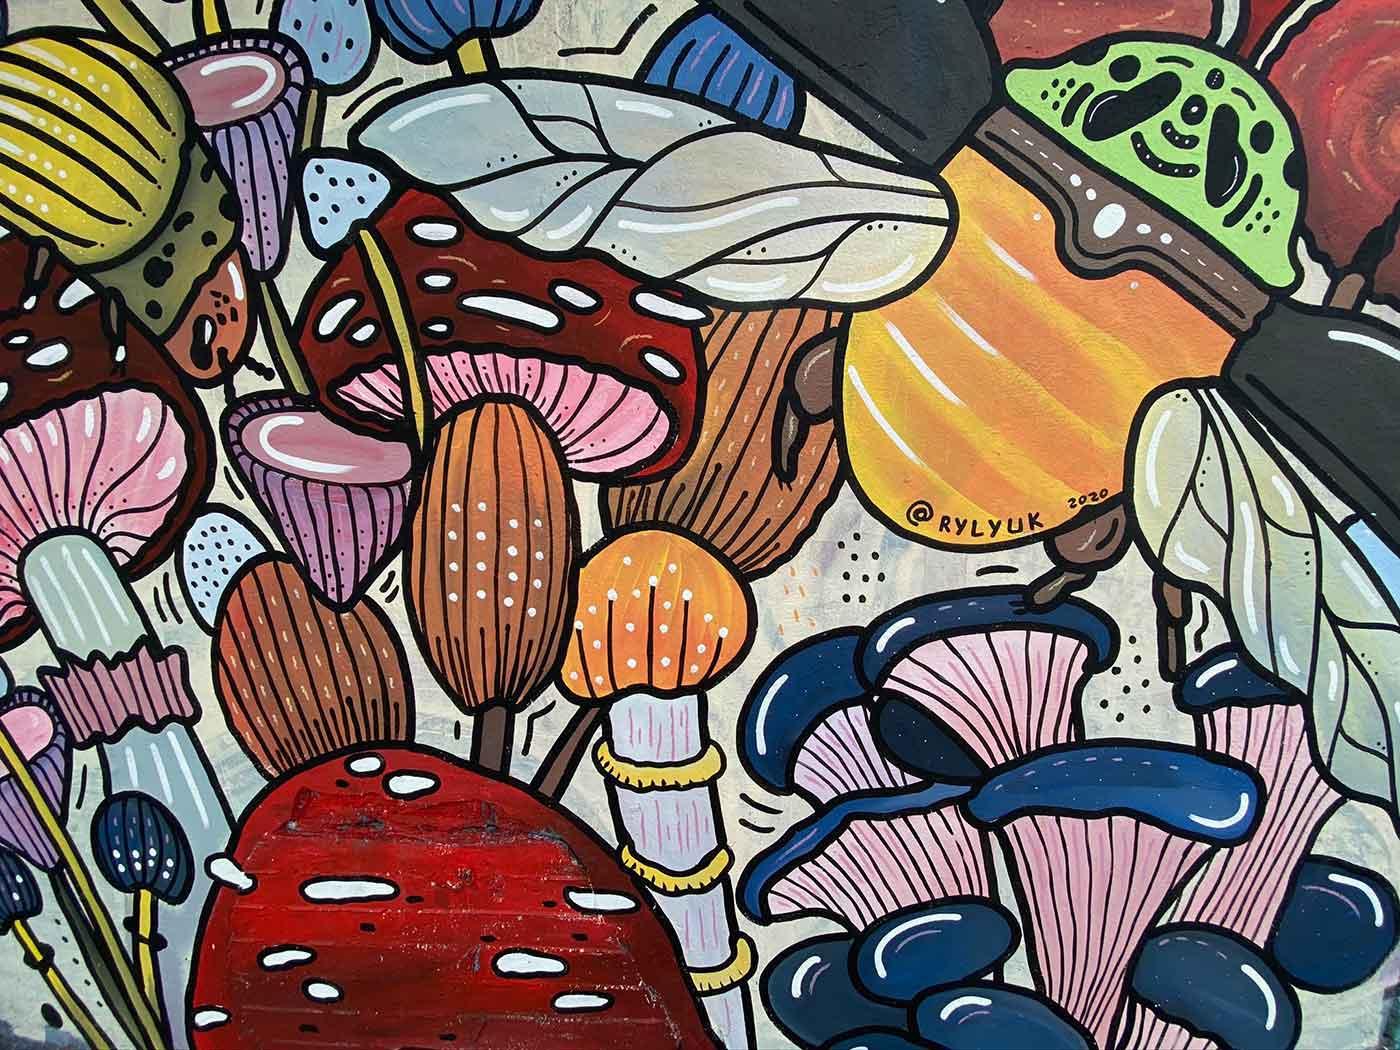 close up mushrooms mural of rylyuk